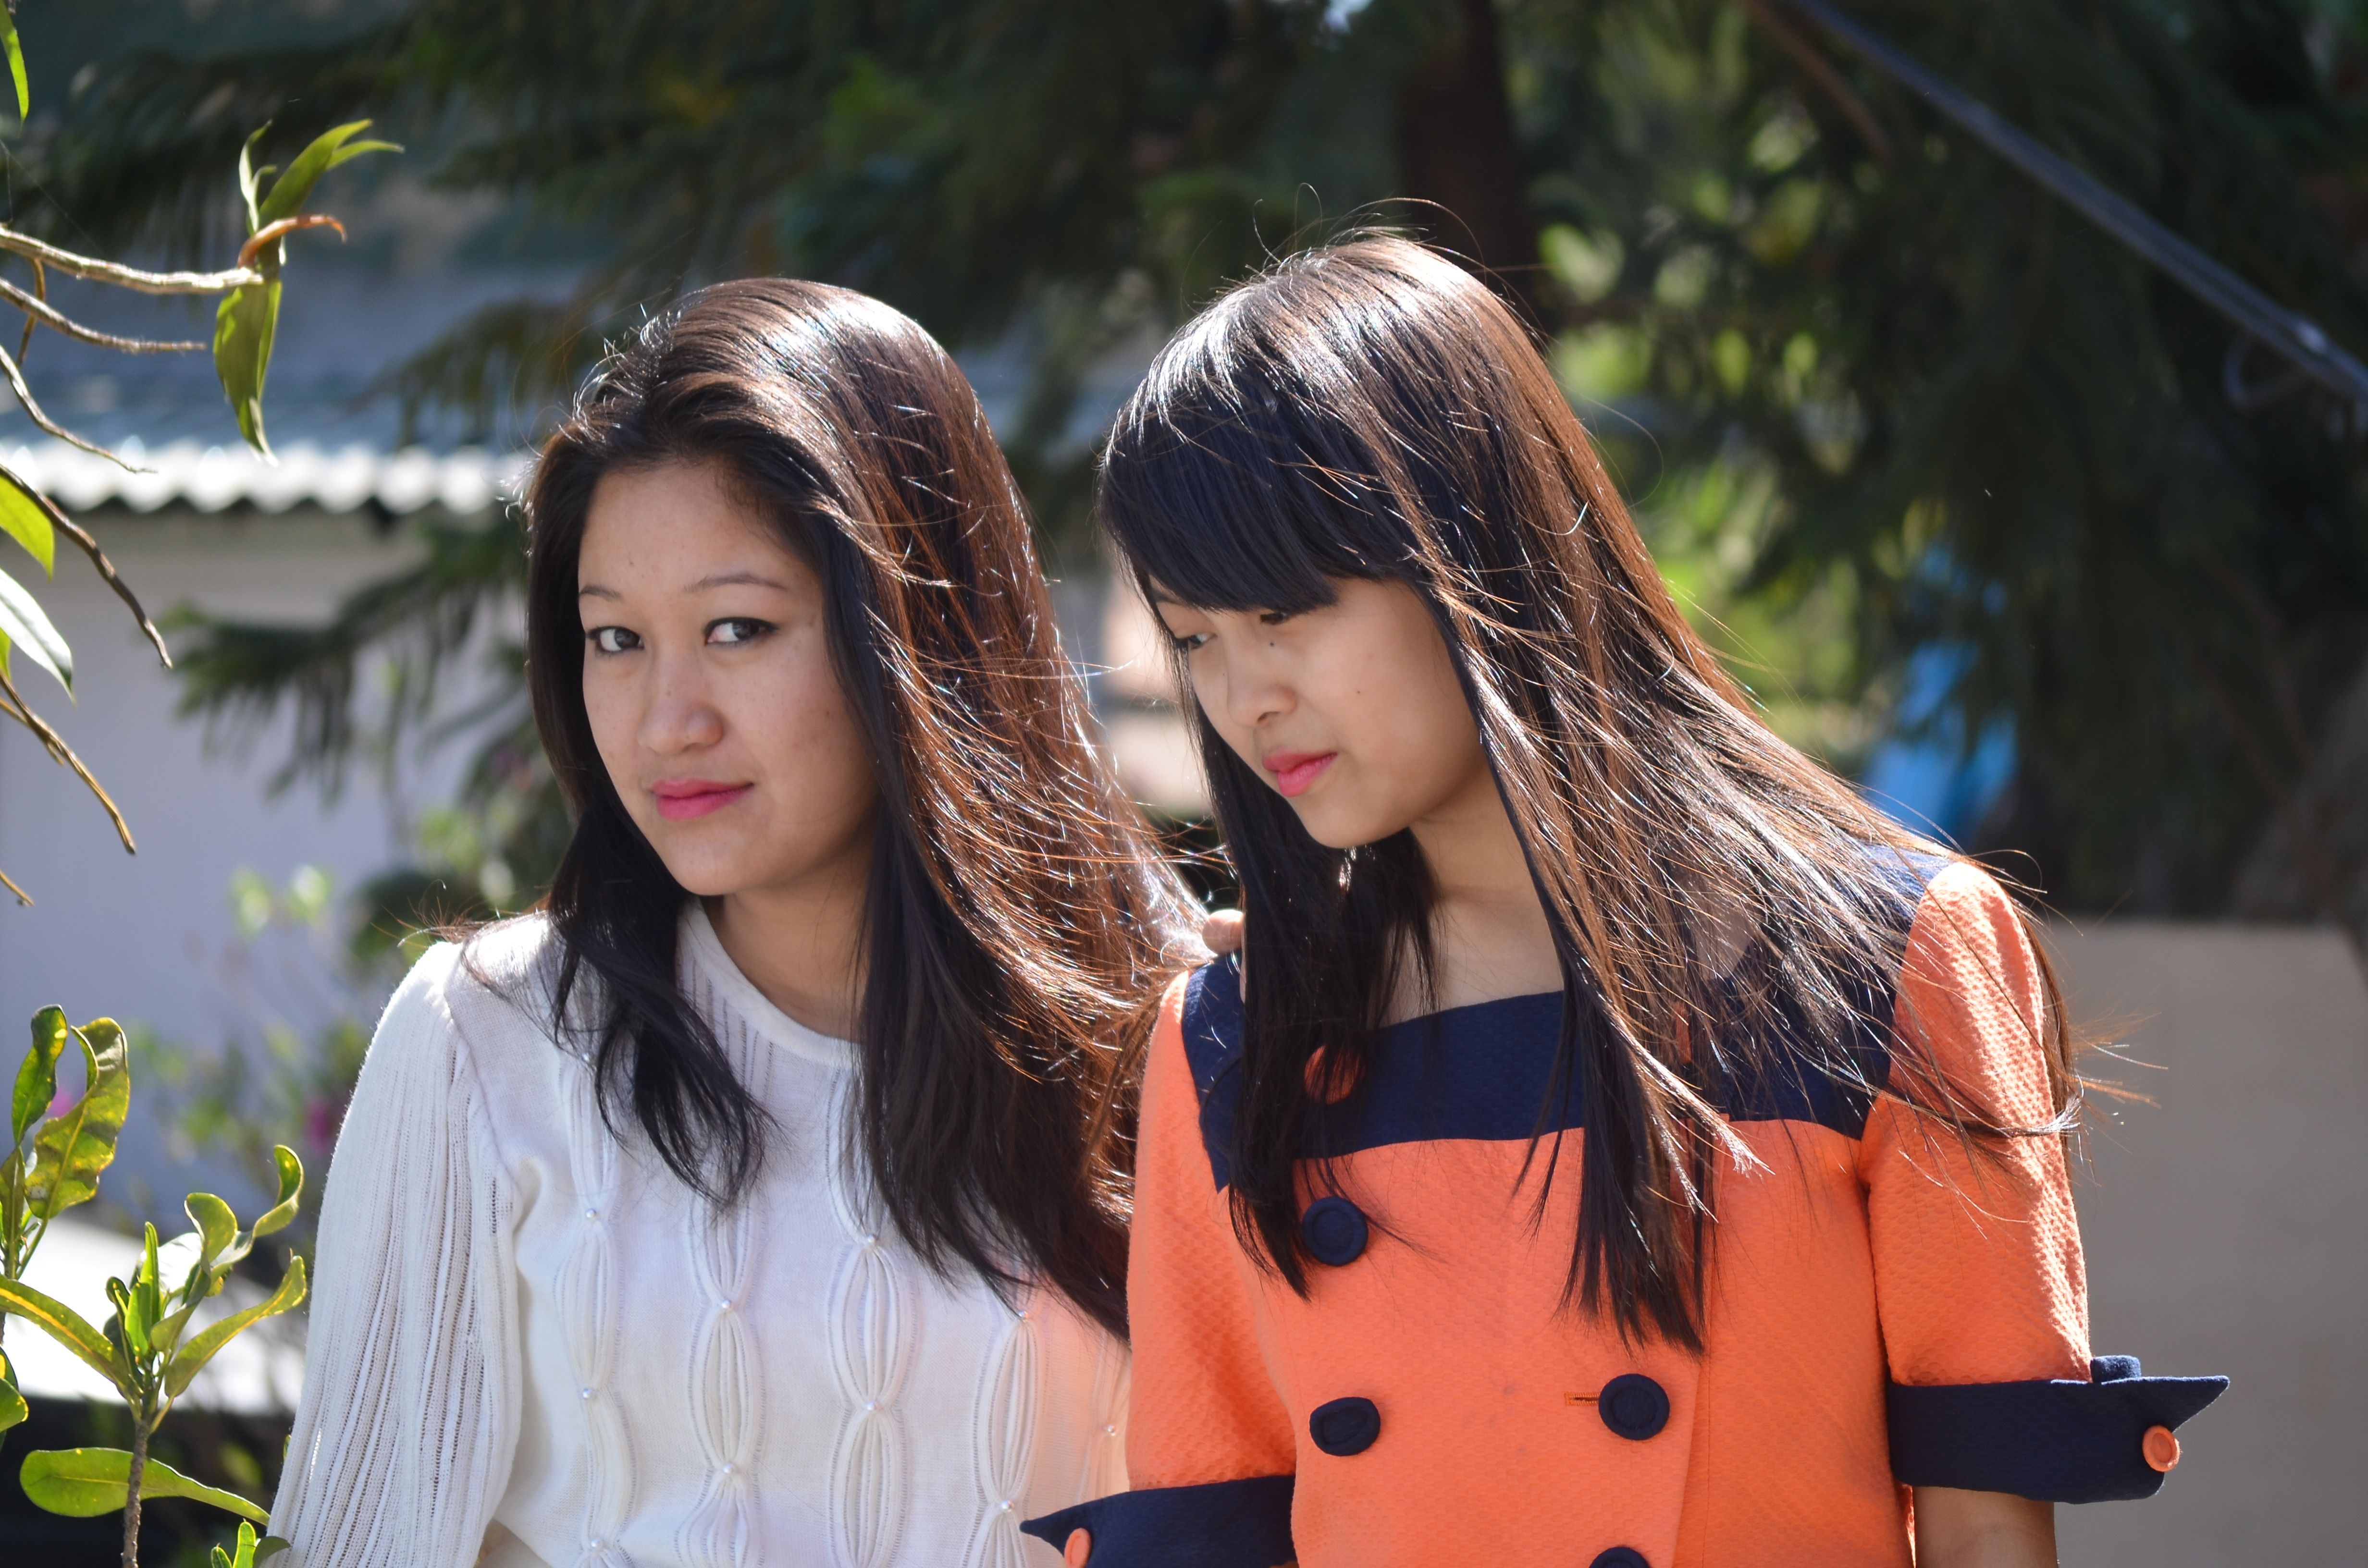 Aizawl girls